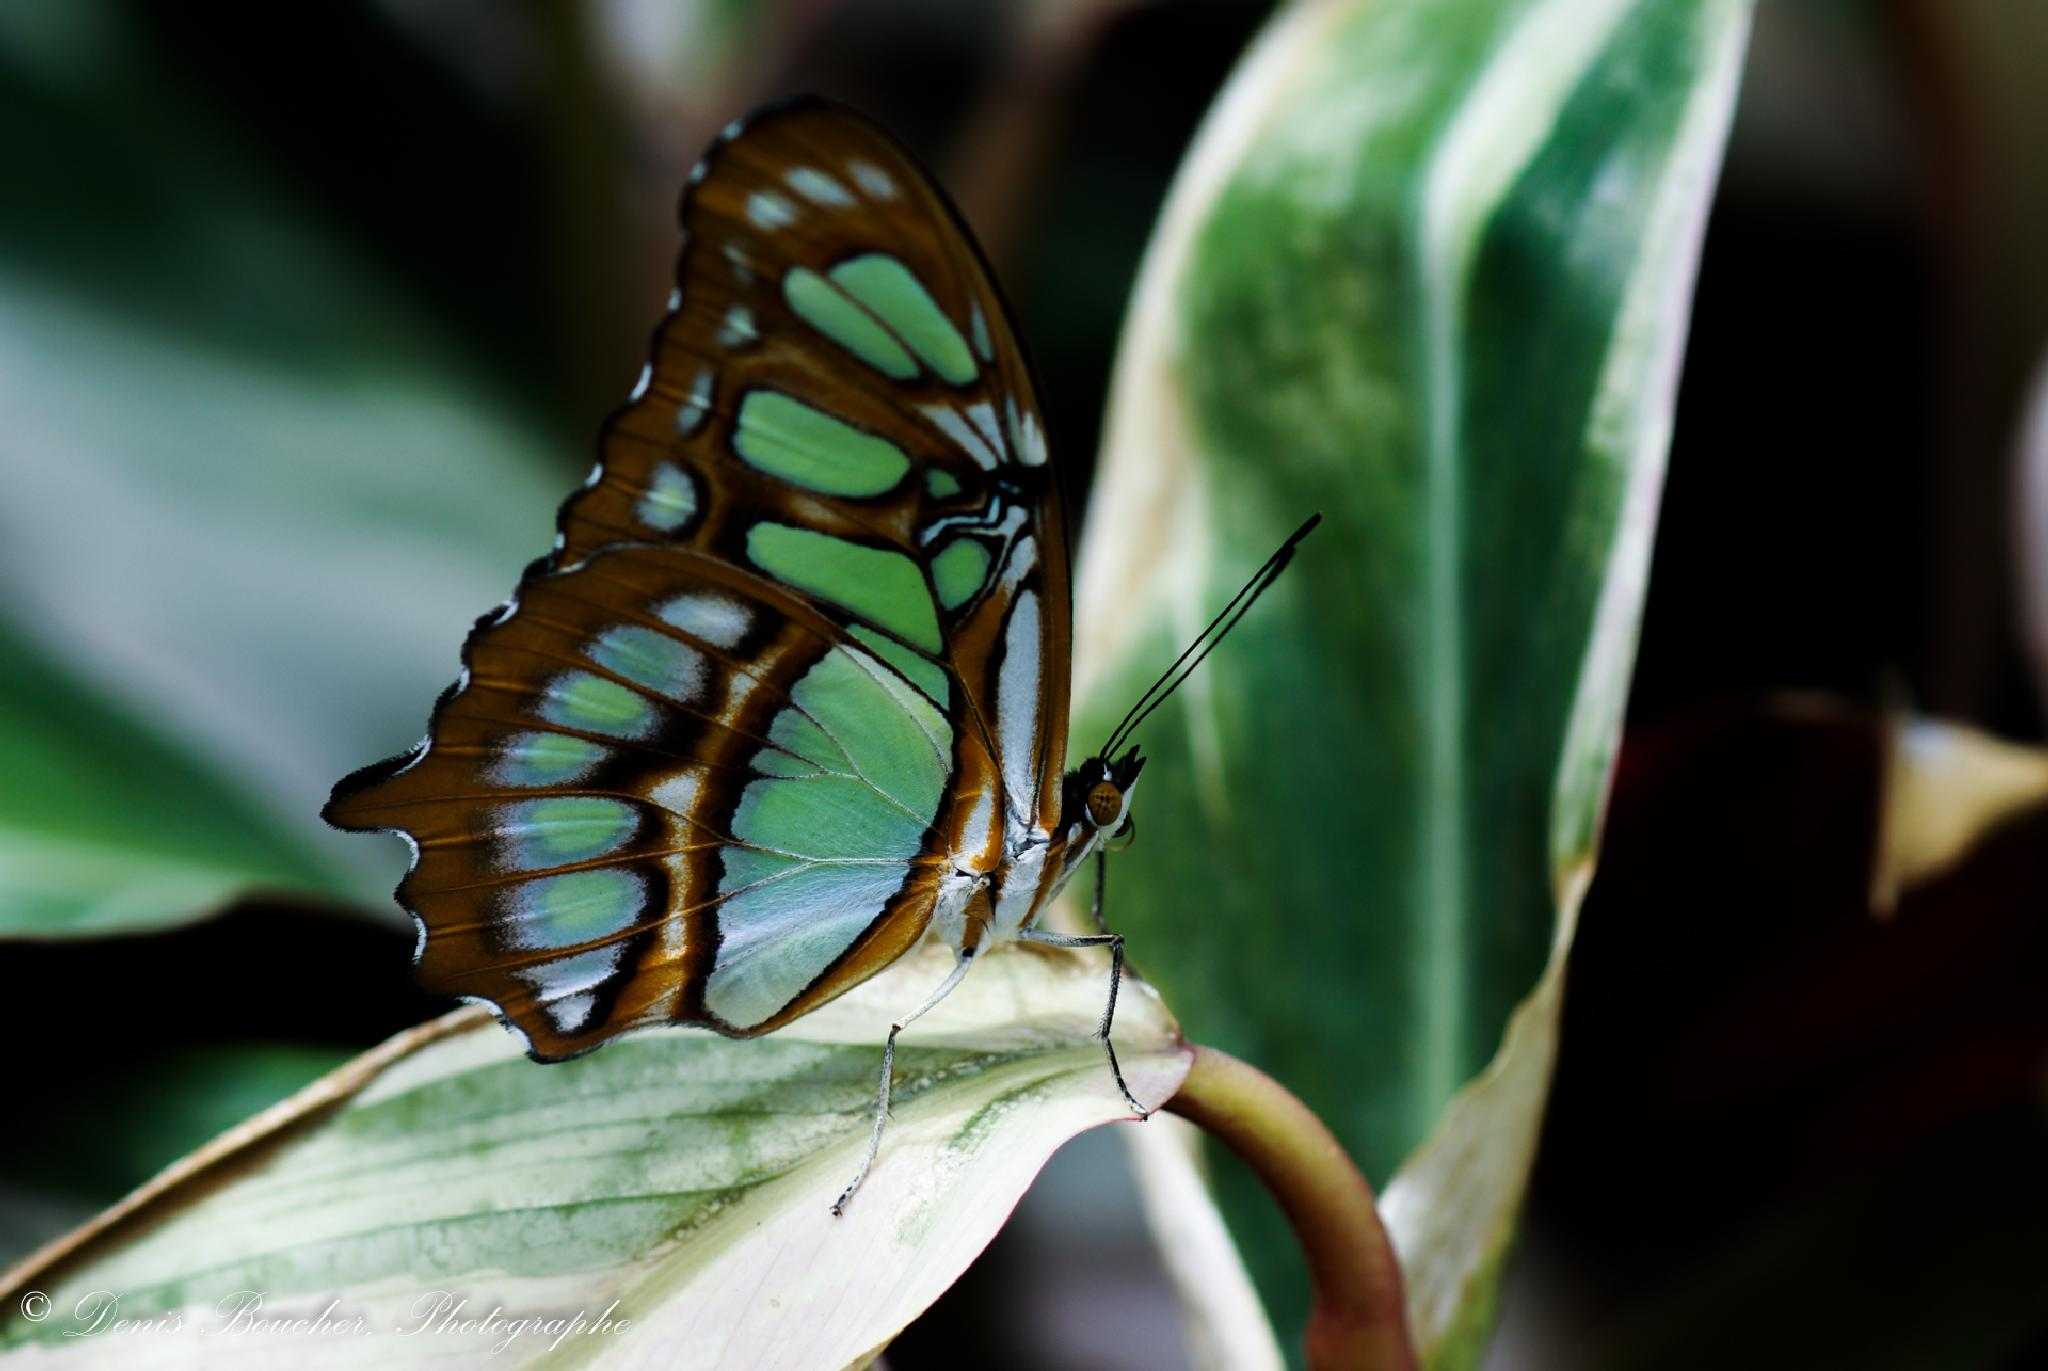 papillon by Denis Boucher